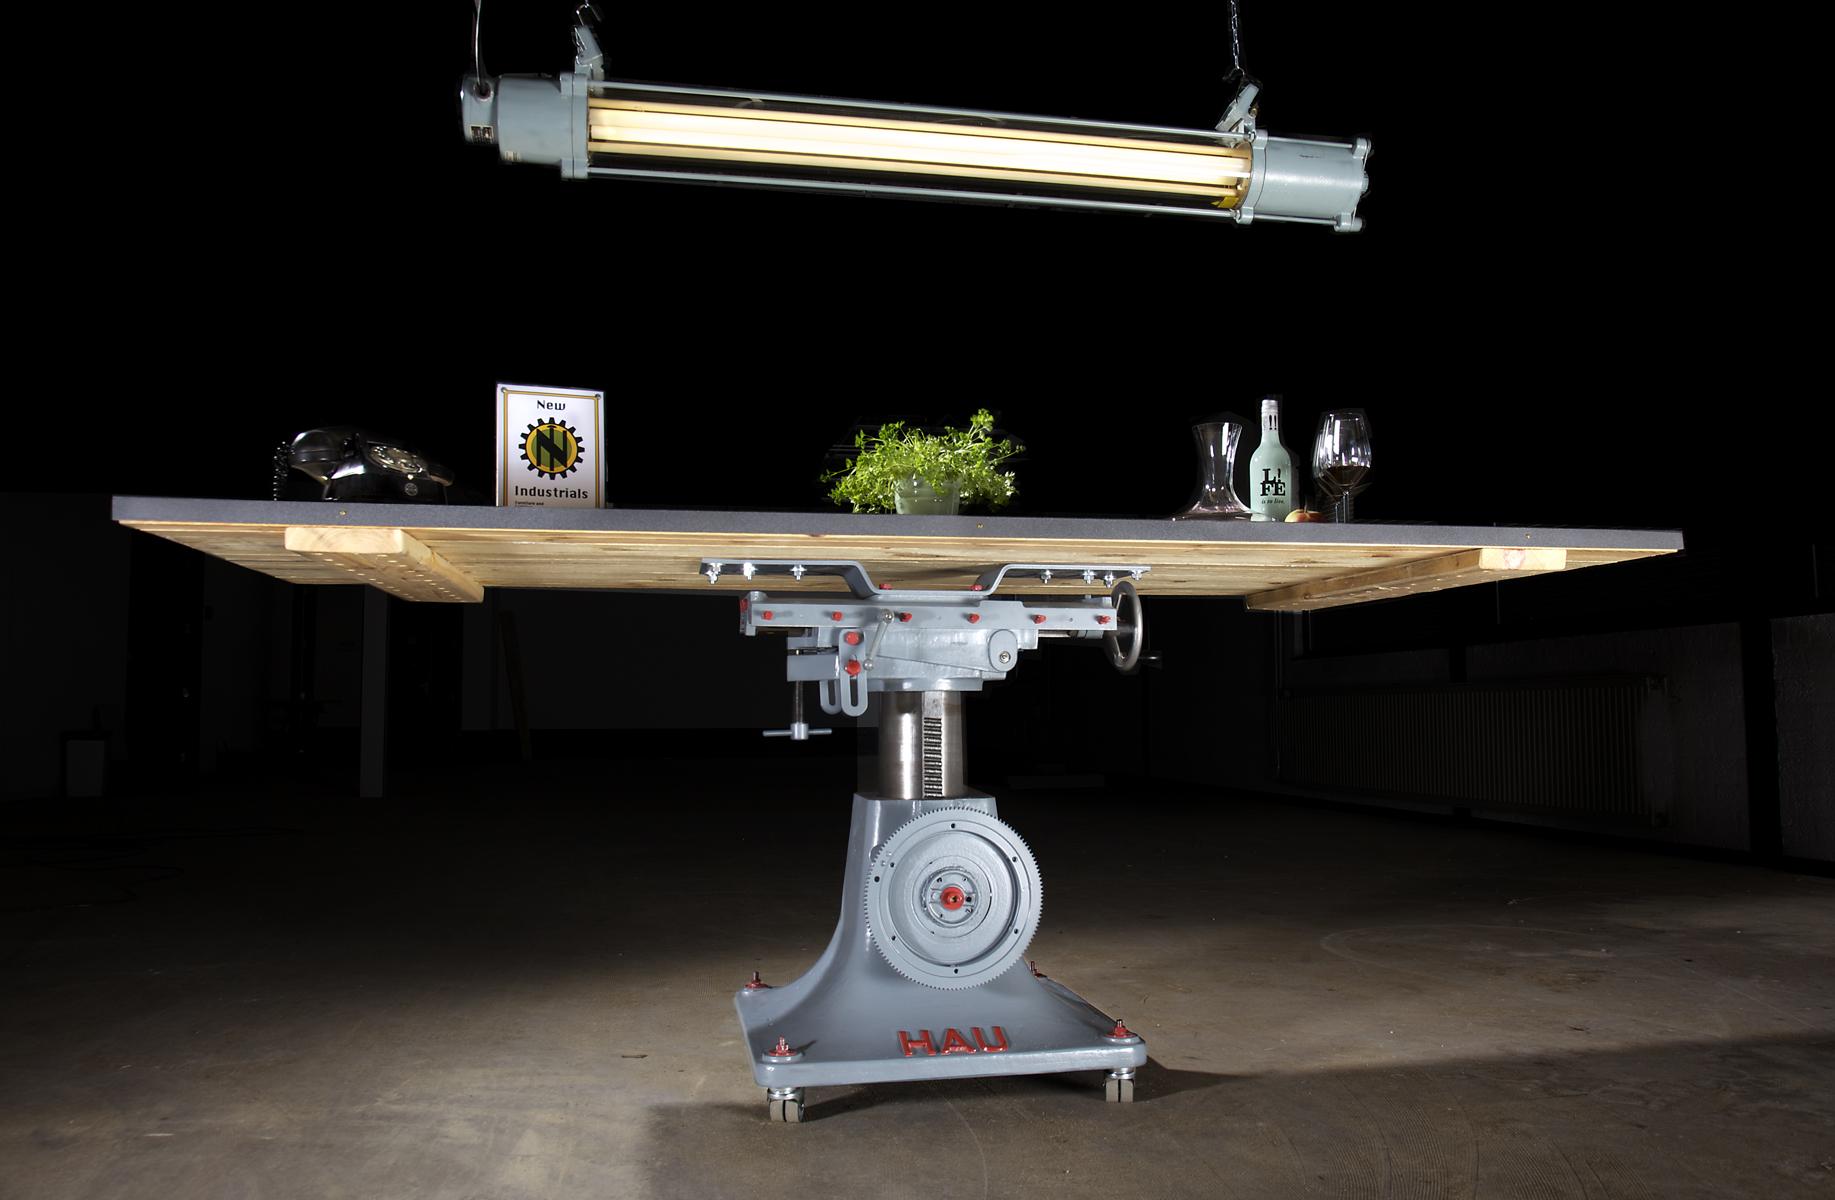 Industri le tafel xxl new industrialsnew industrials for Tafel hoogte